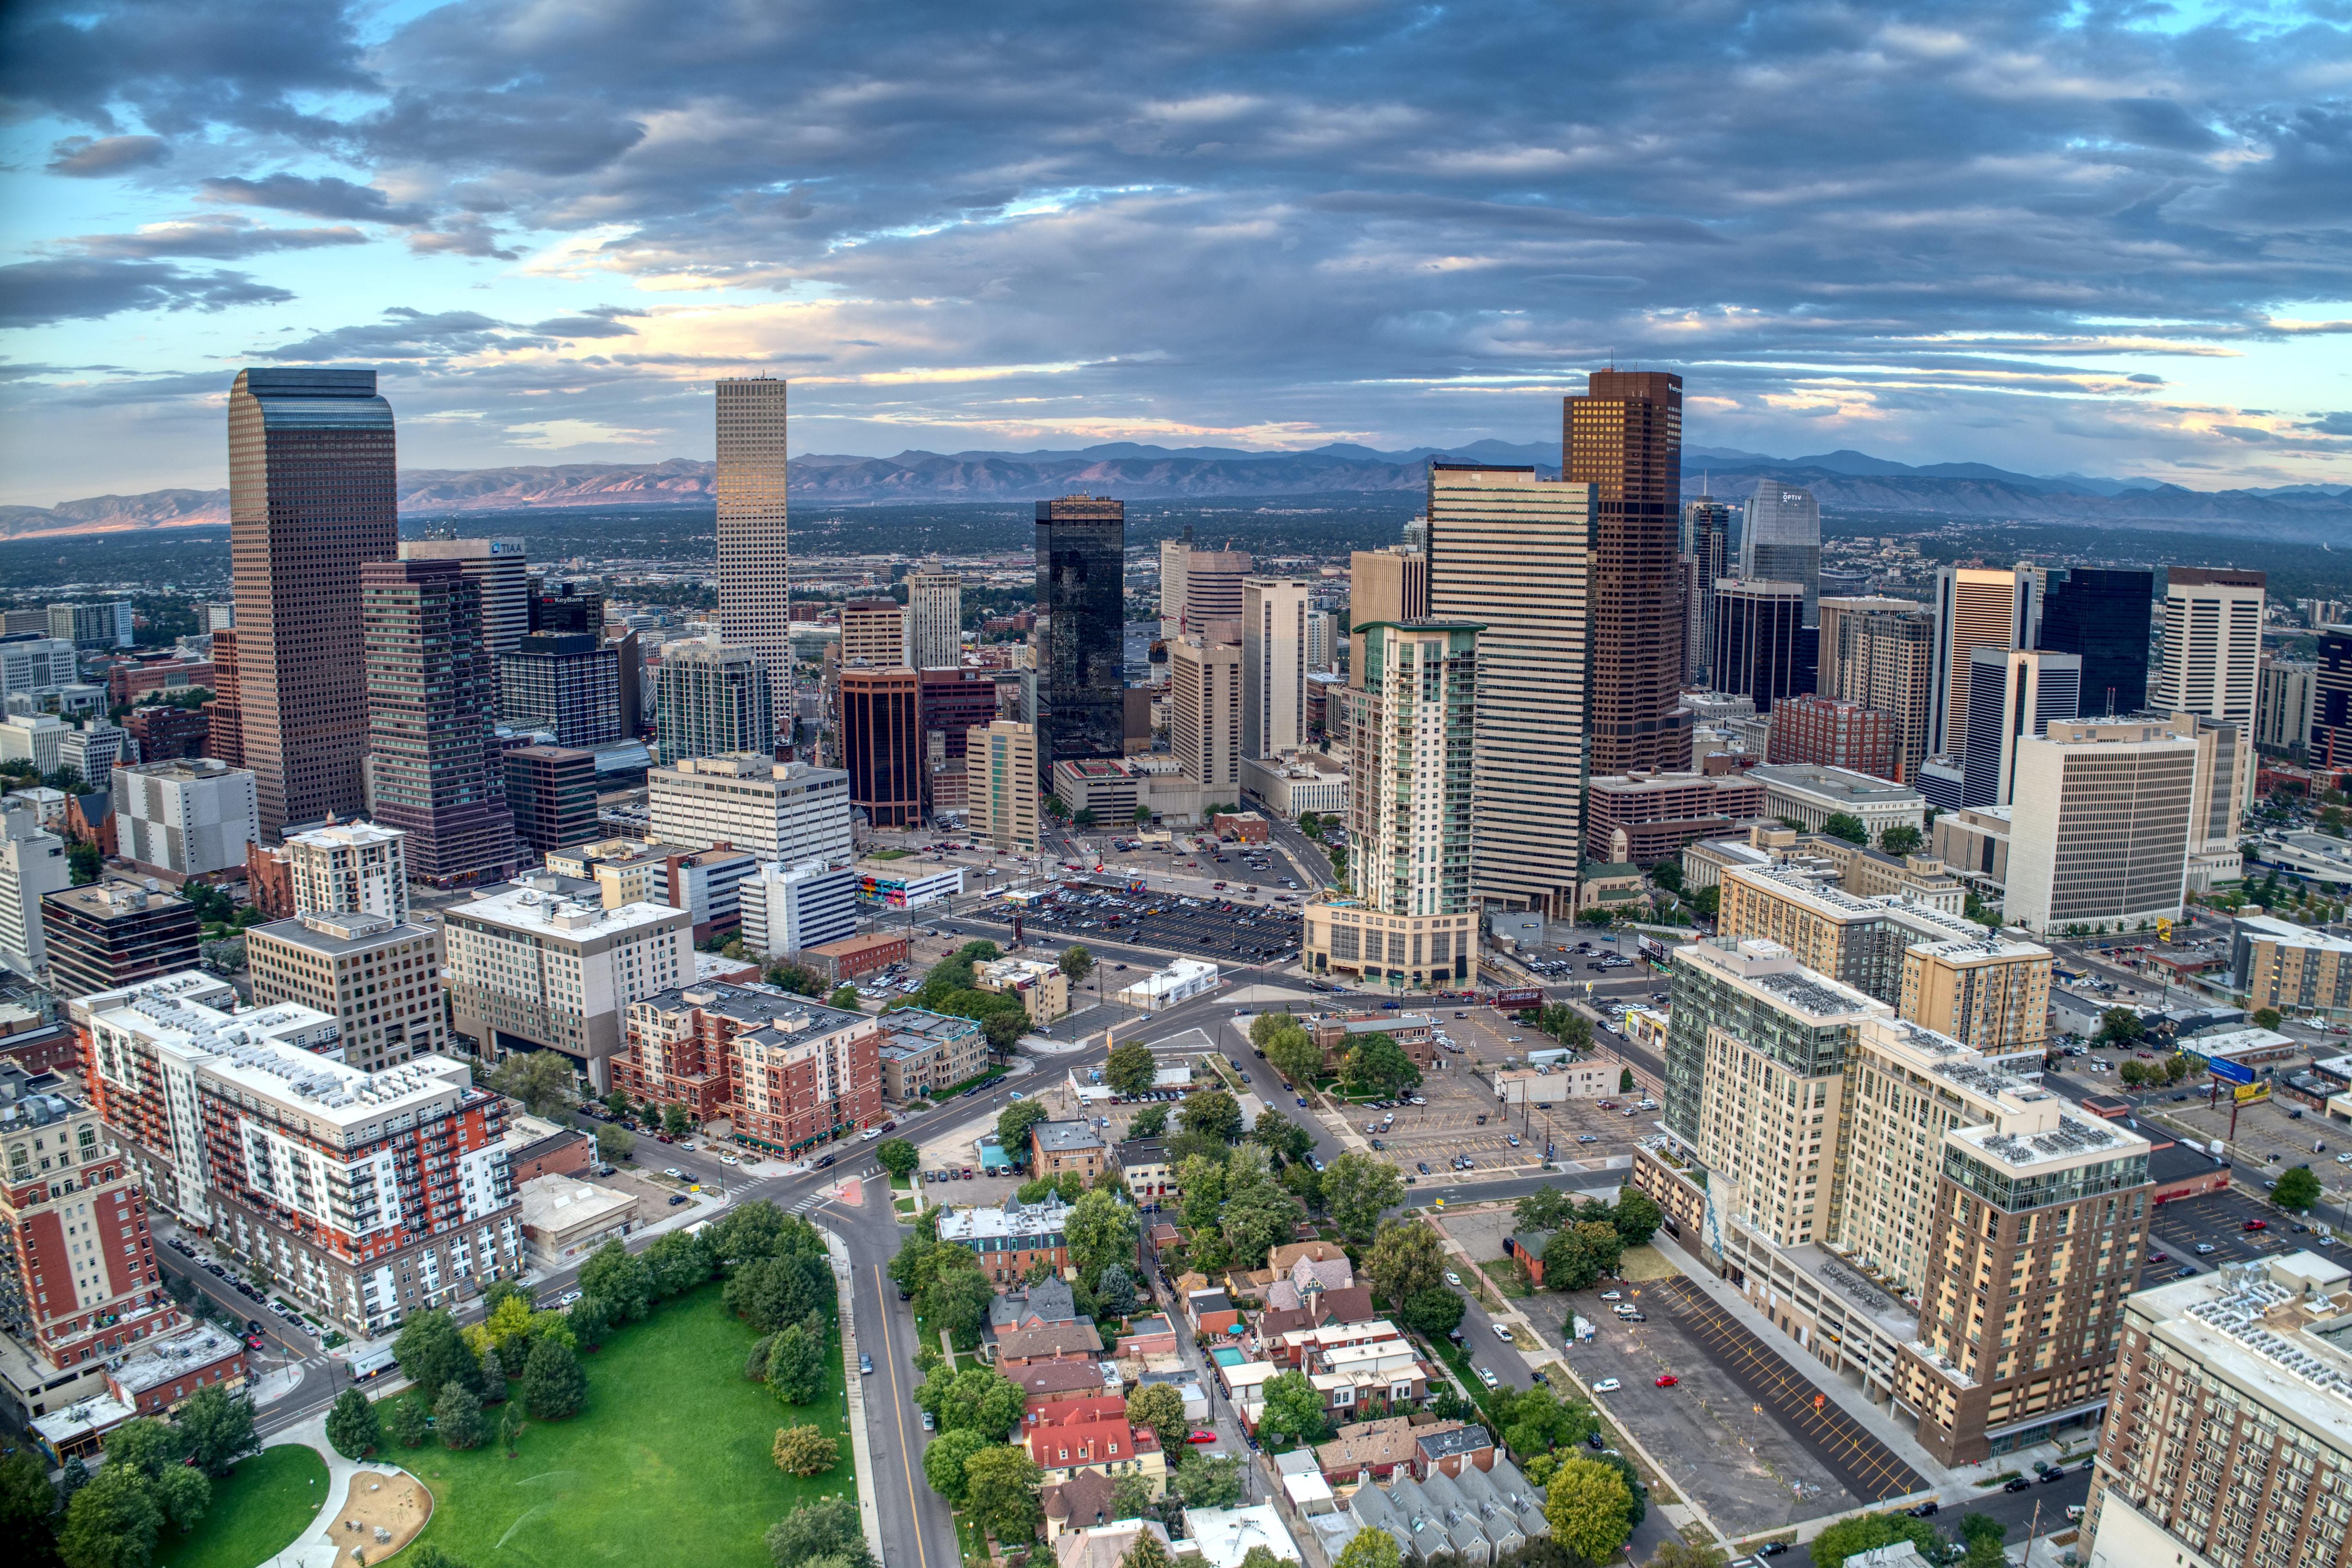 Top 50+ Tech Companies In Denver In 2021